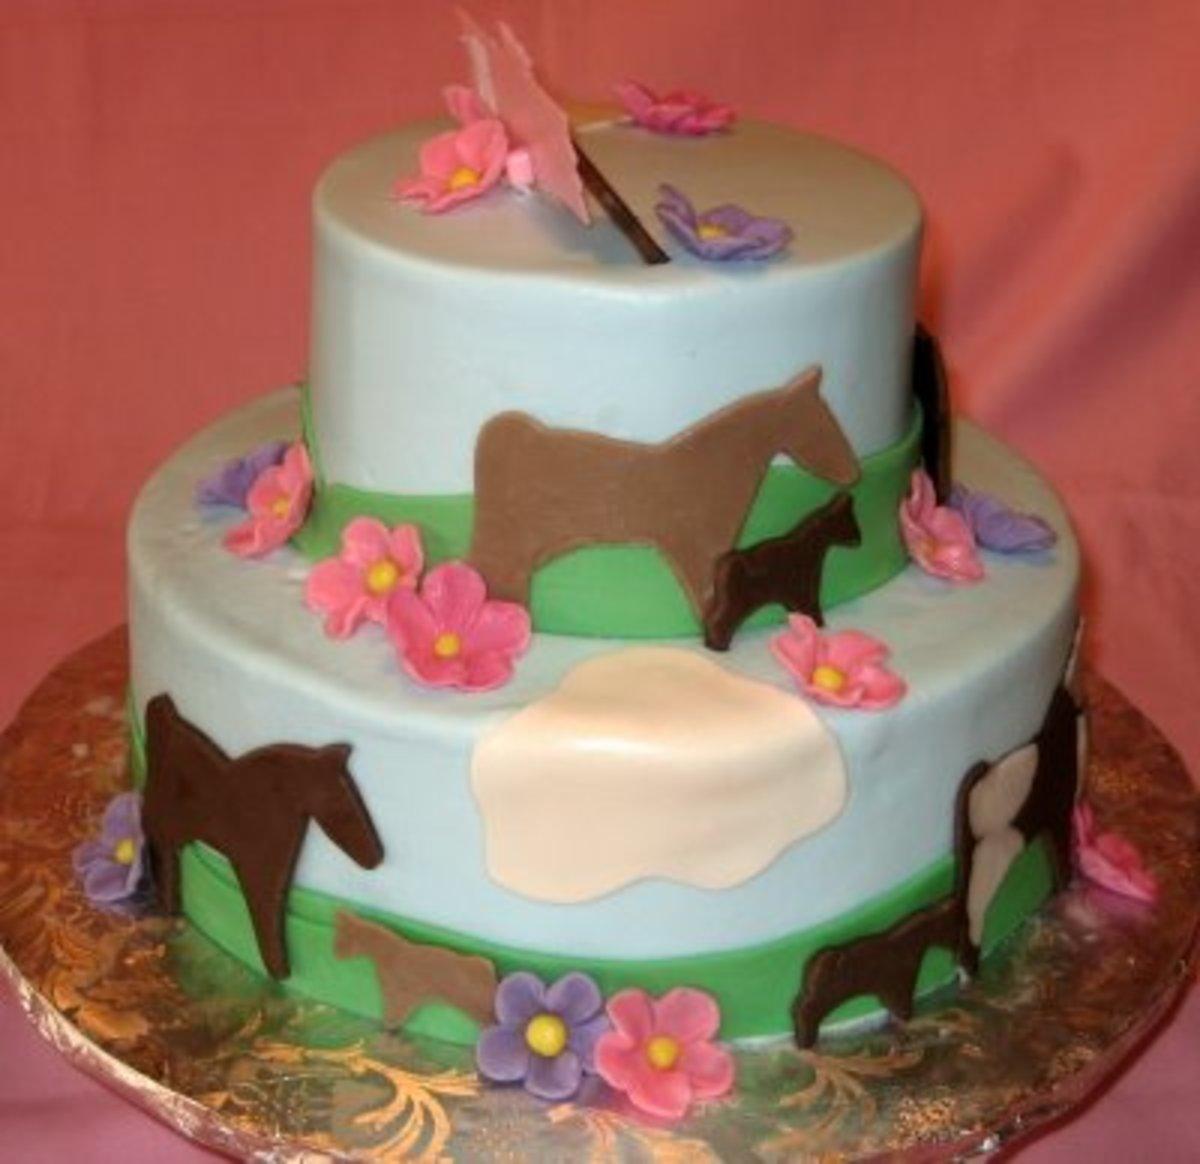 agardenofcakes.blogspot.com